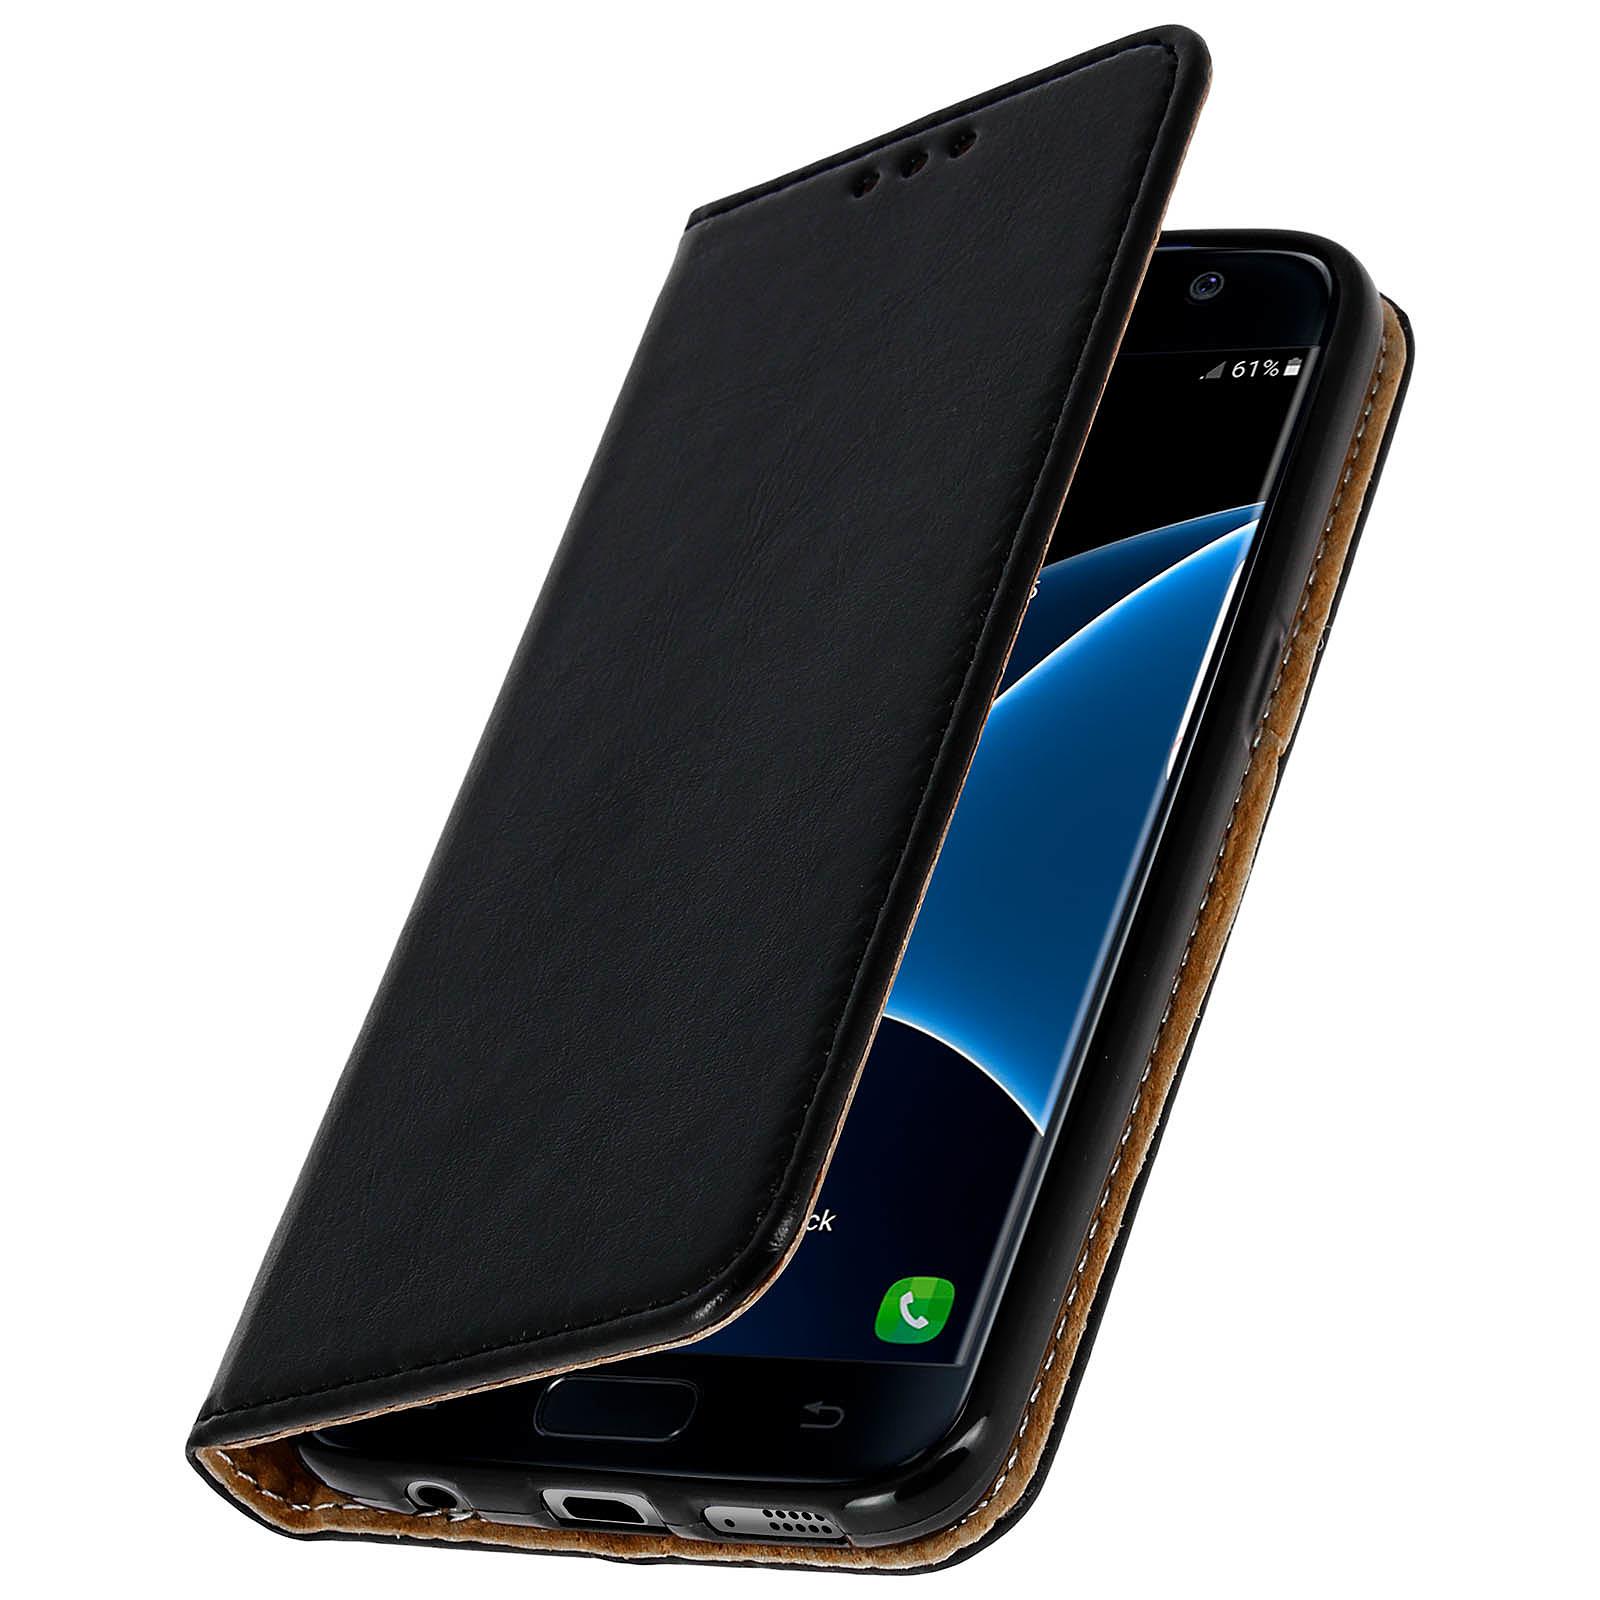 Avizar Etui folio Noir pour Samsung Galaxy S7 Edge